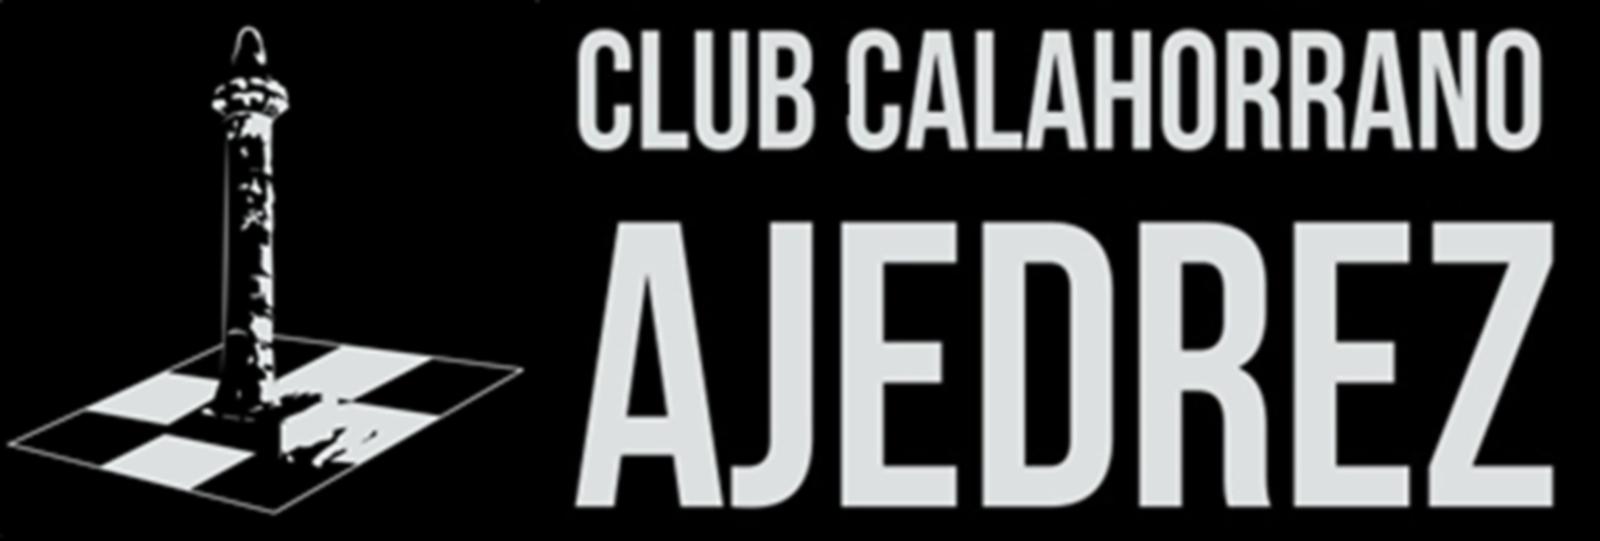 Club Calahorrano Ajedrez